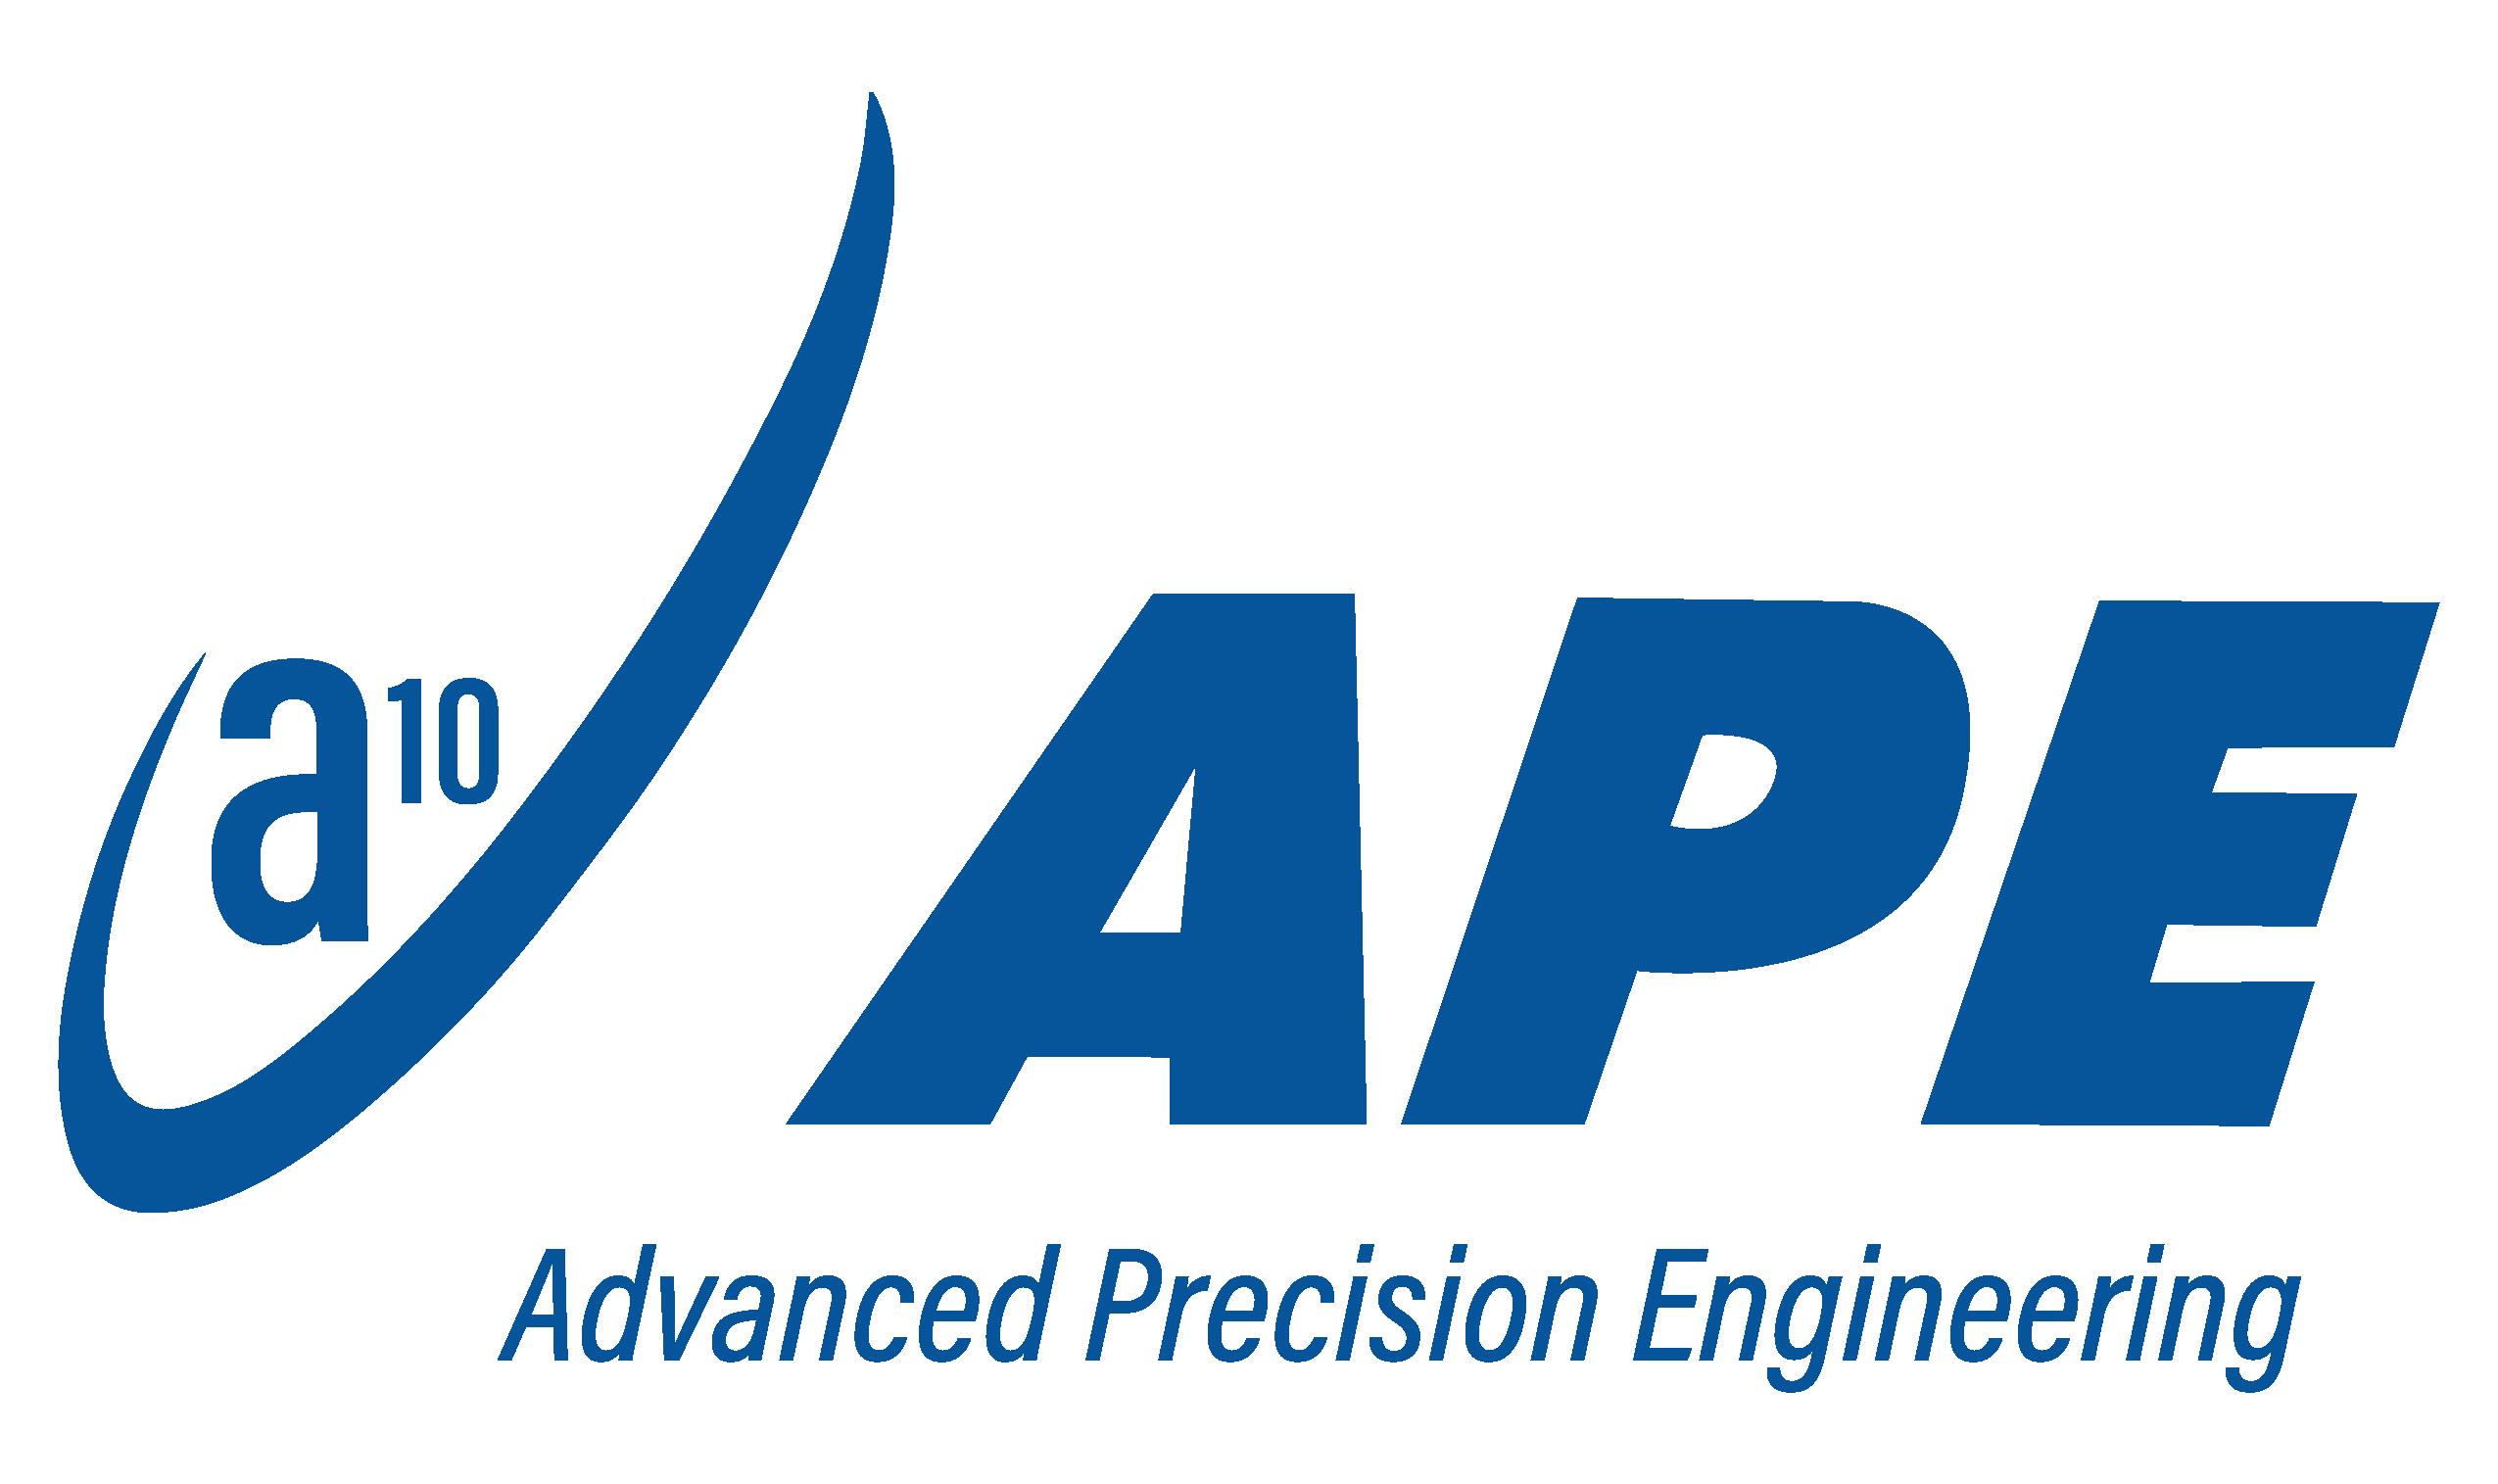 Advanced Precision Engineering